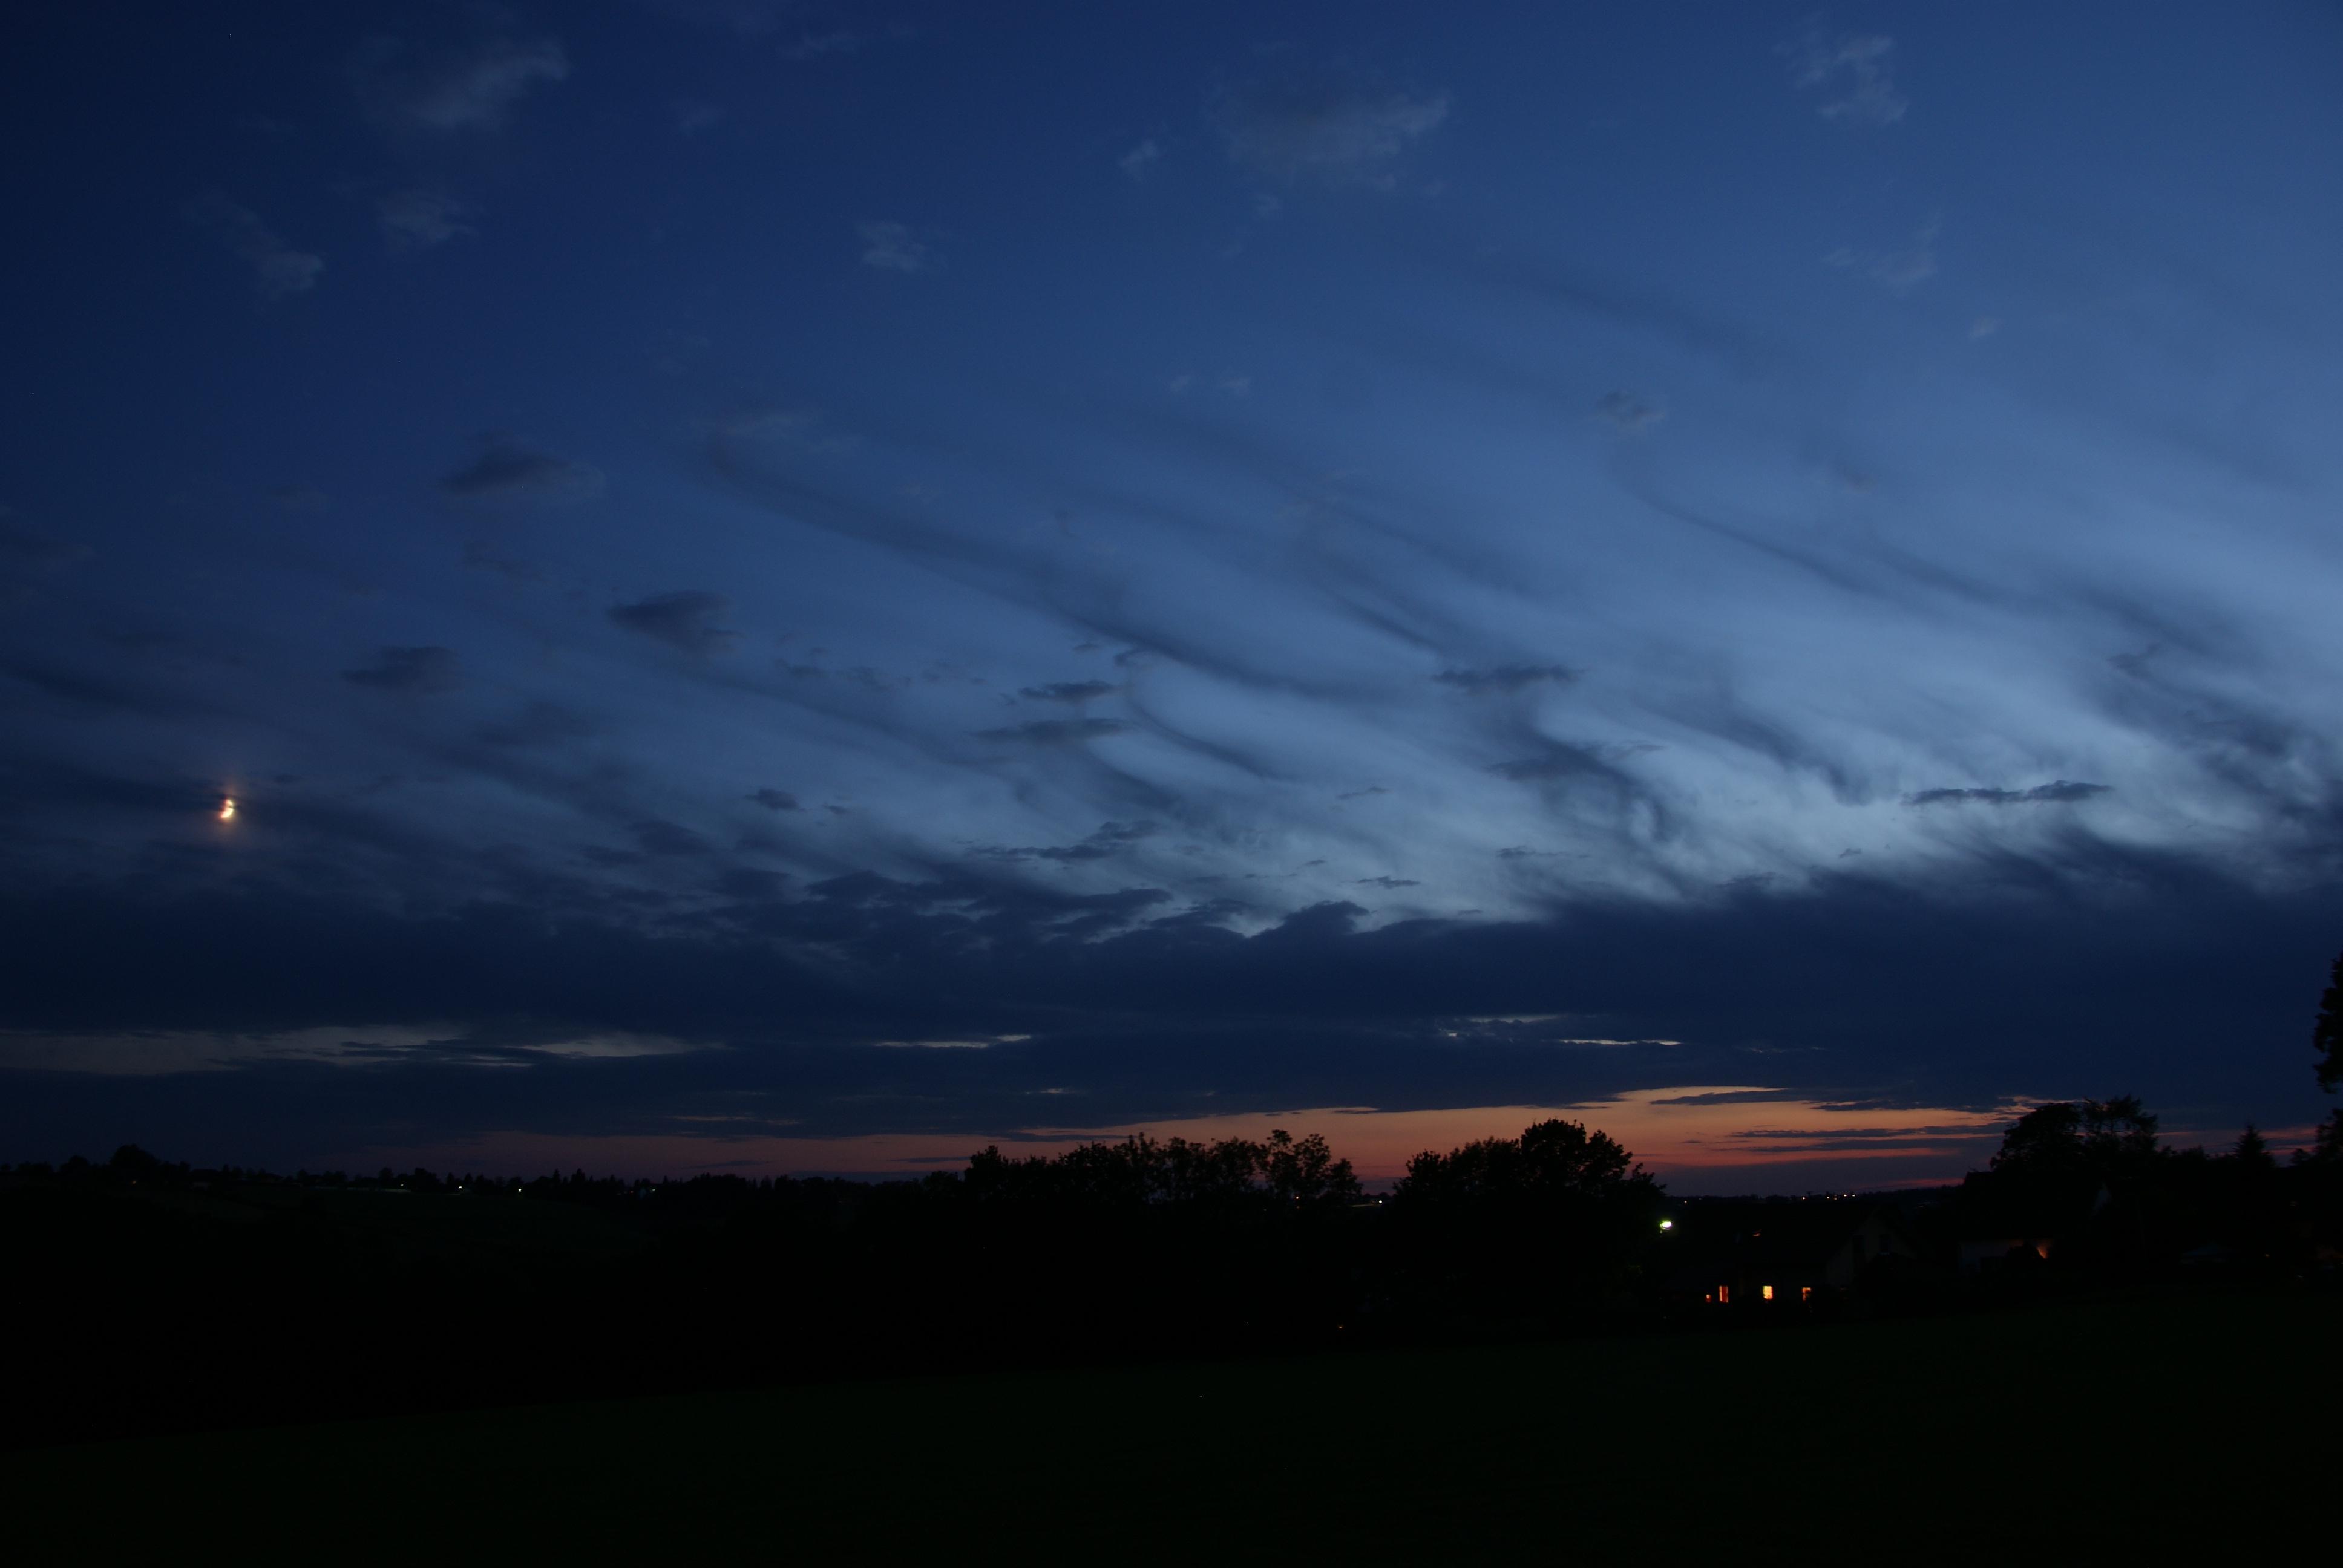 File:Evening sky near Passau.jpg - Wikimedia Commons